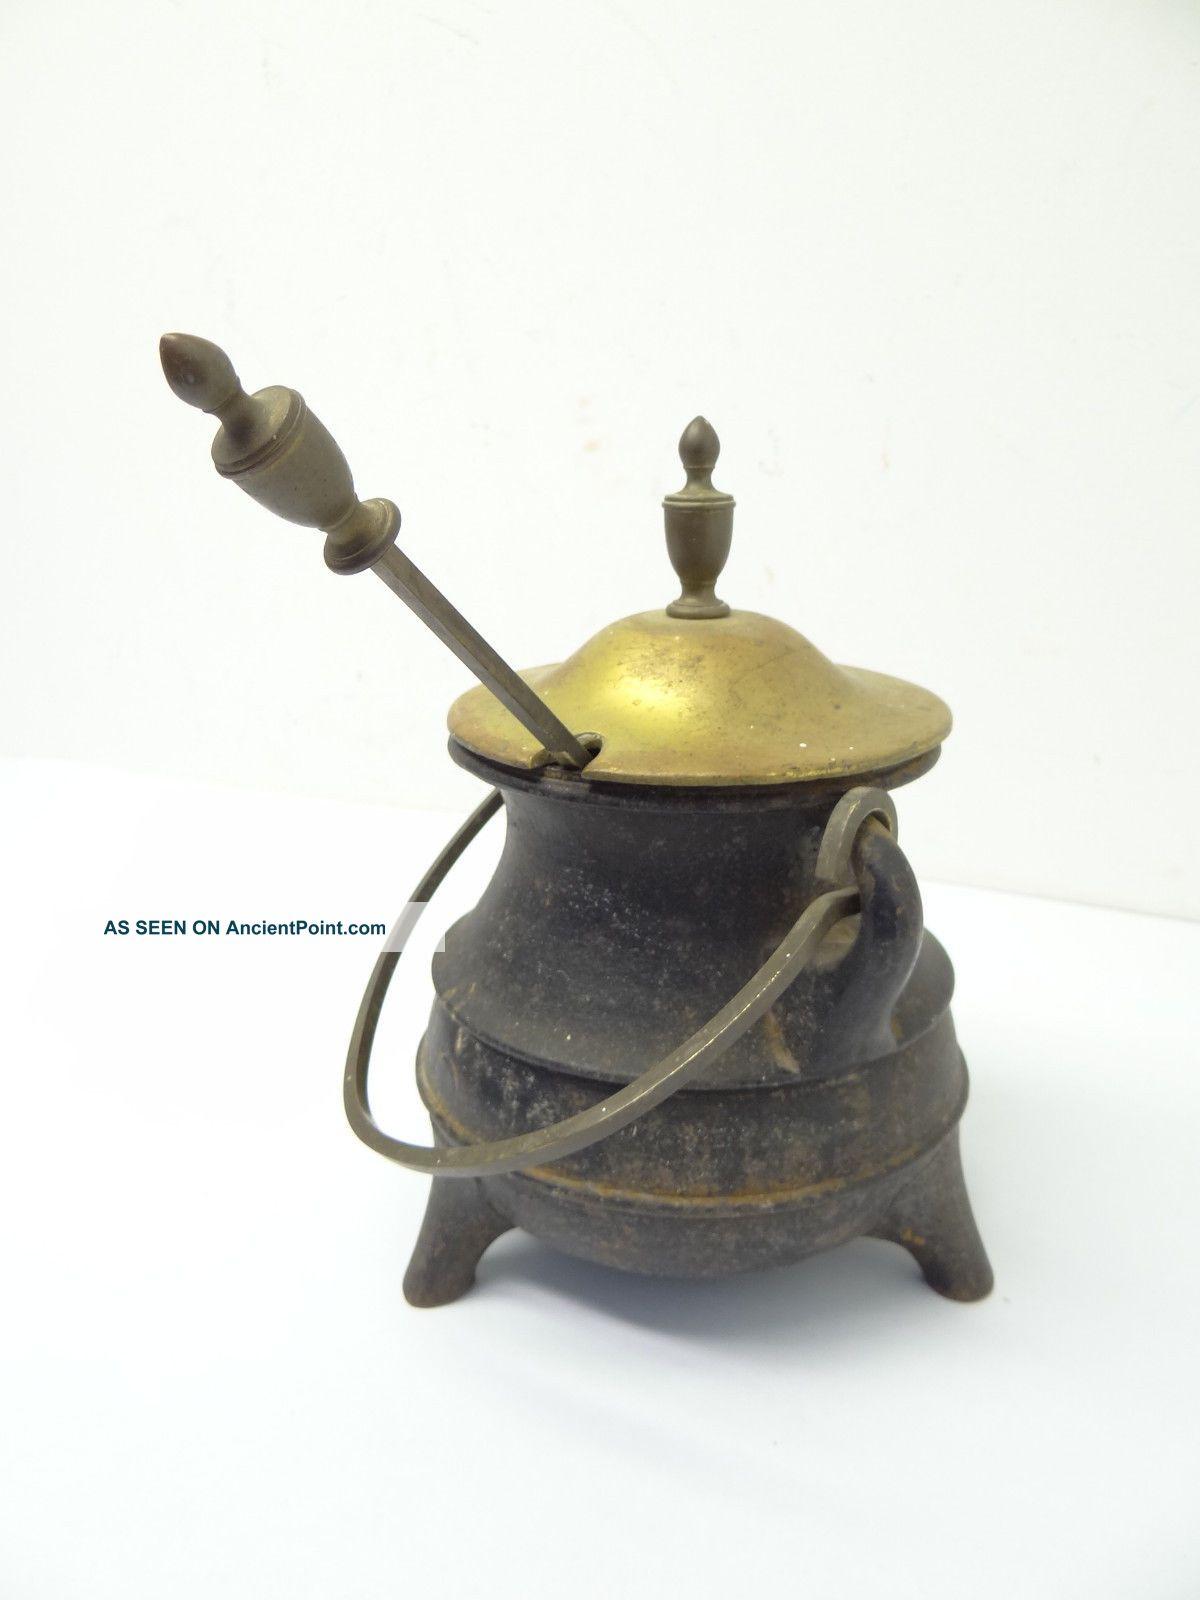 Antique Old Metal Cast Iron Brass Top Fireplace Fire Starter Ash Roller Pot Tool Hearth Ware photo